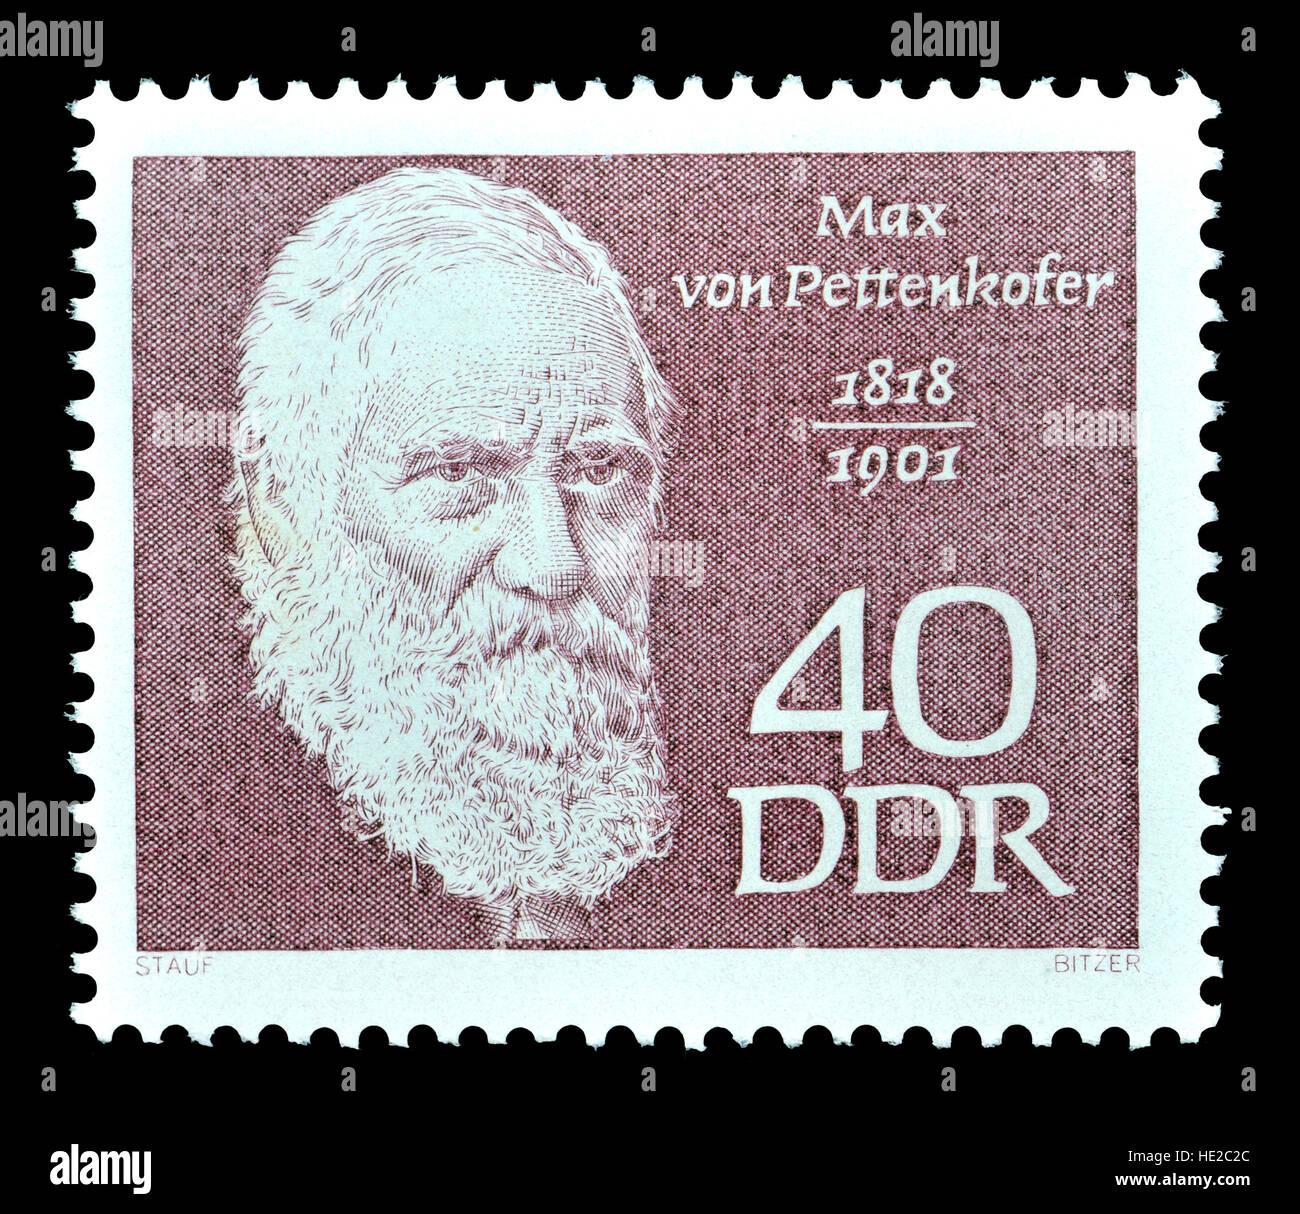 East German postage stamp (1968) : Max Joseph von Pettenkofer (1818 – 1901) Bavarian chemist and hygienist - Stock Image